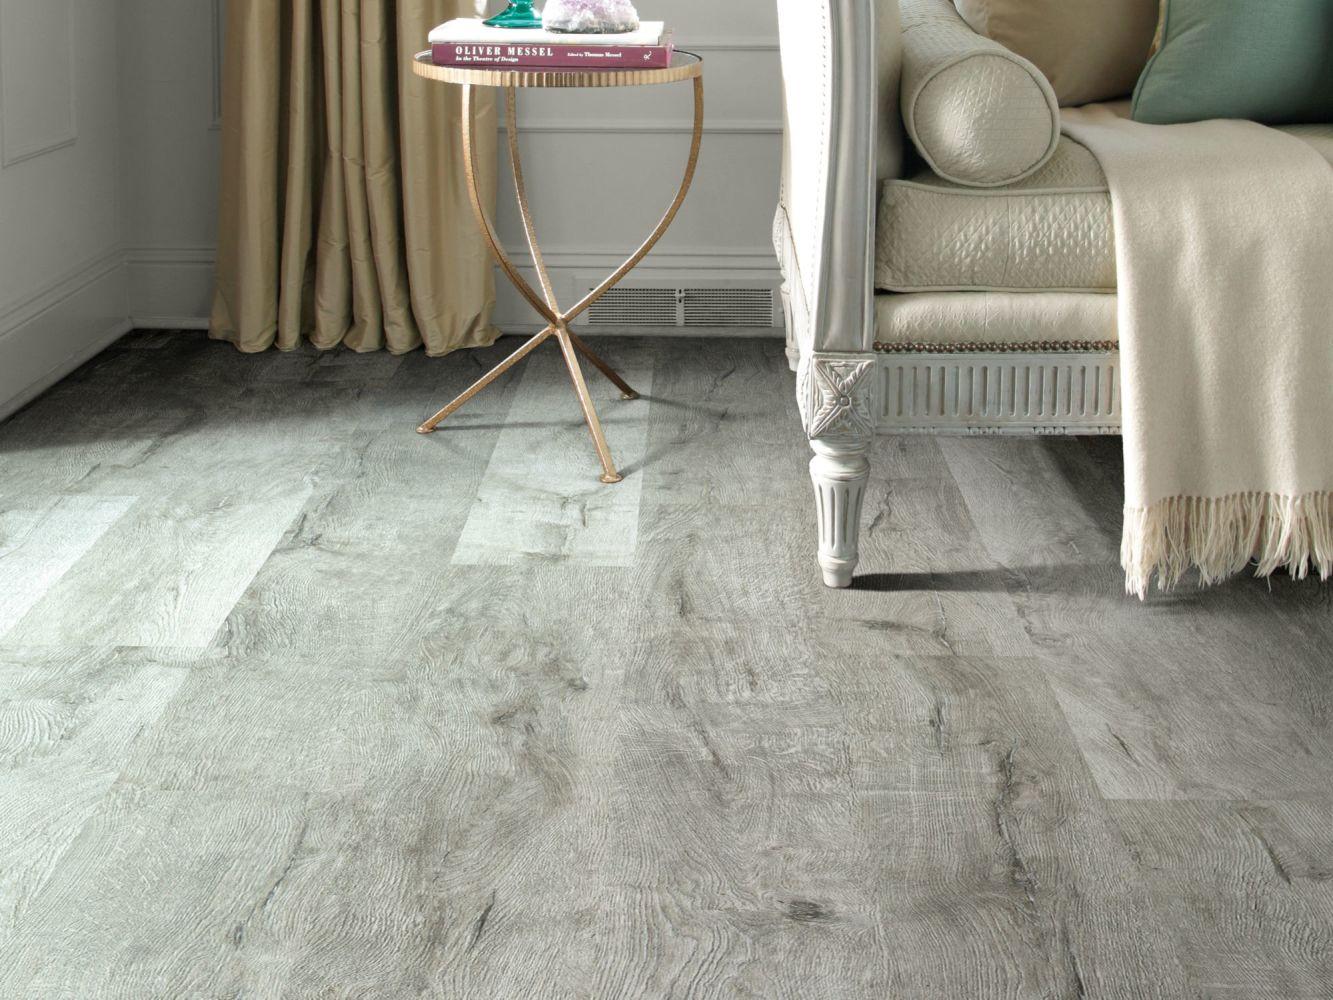 Shaw Floors Resilient Property Solutions Bari HD Plus Tortona 00156_VE315